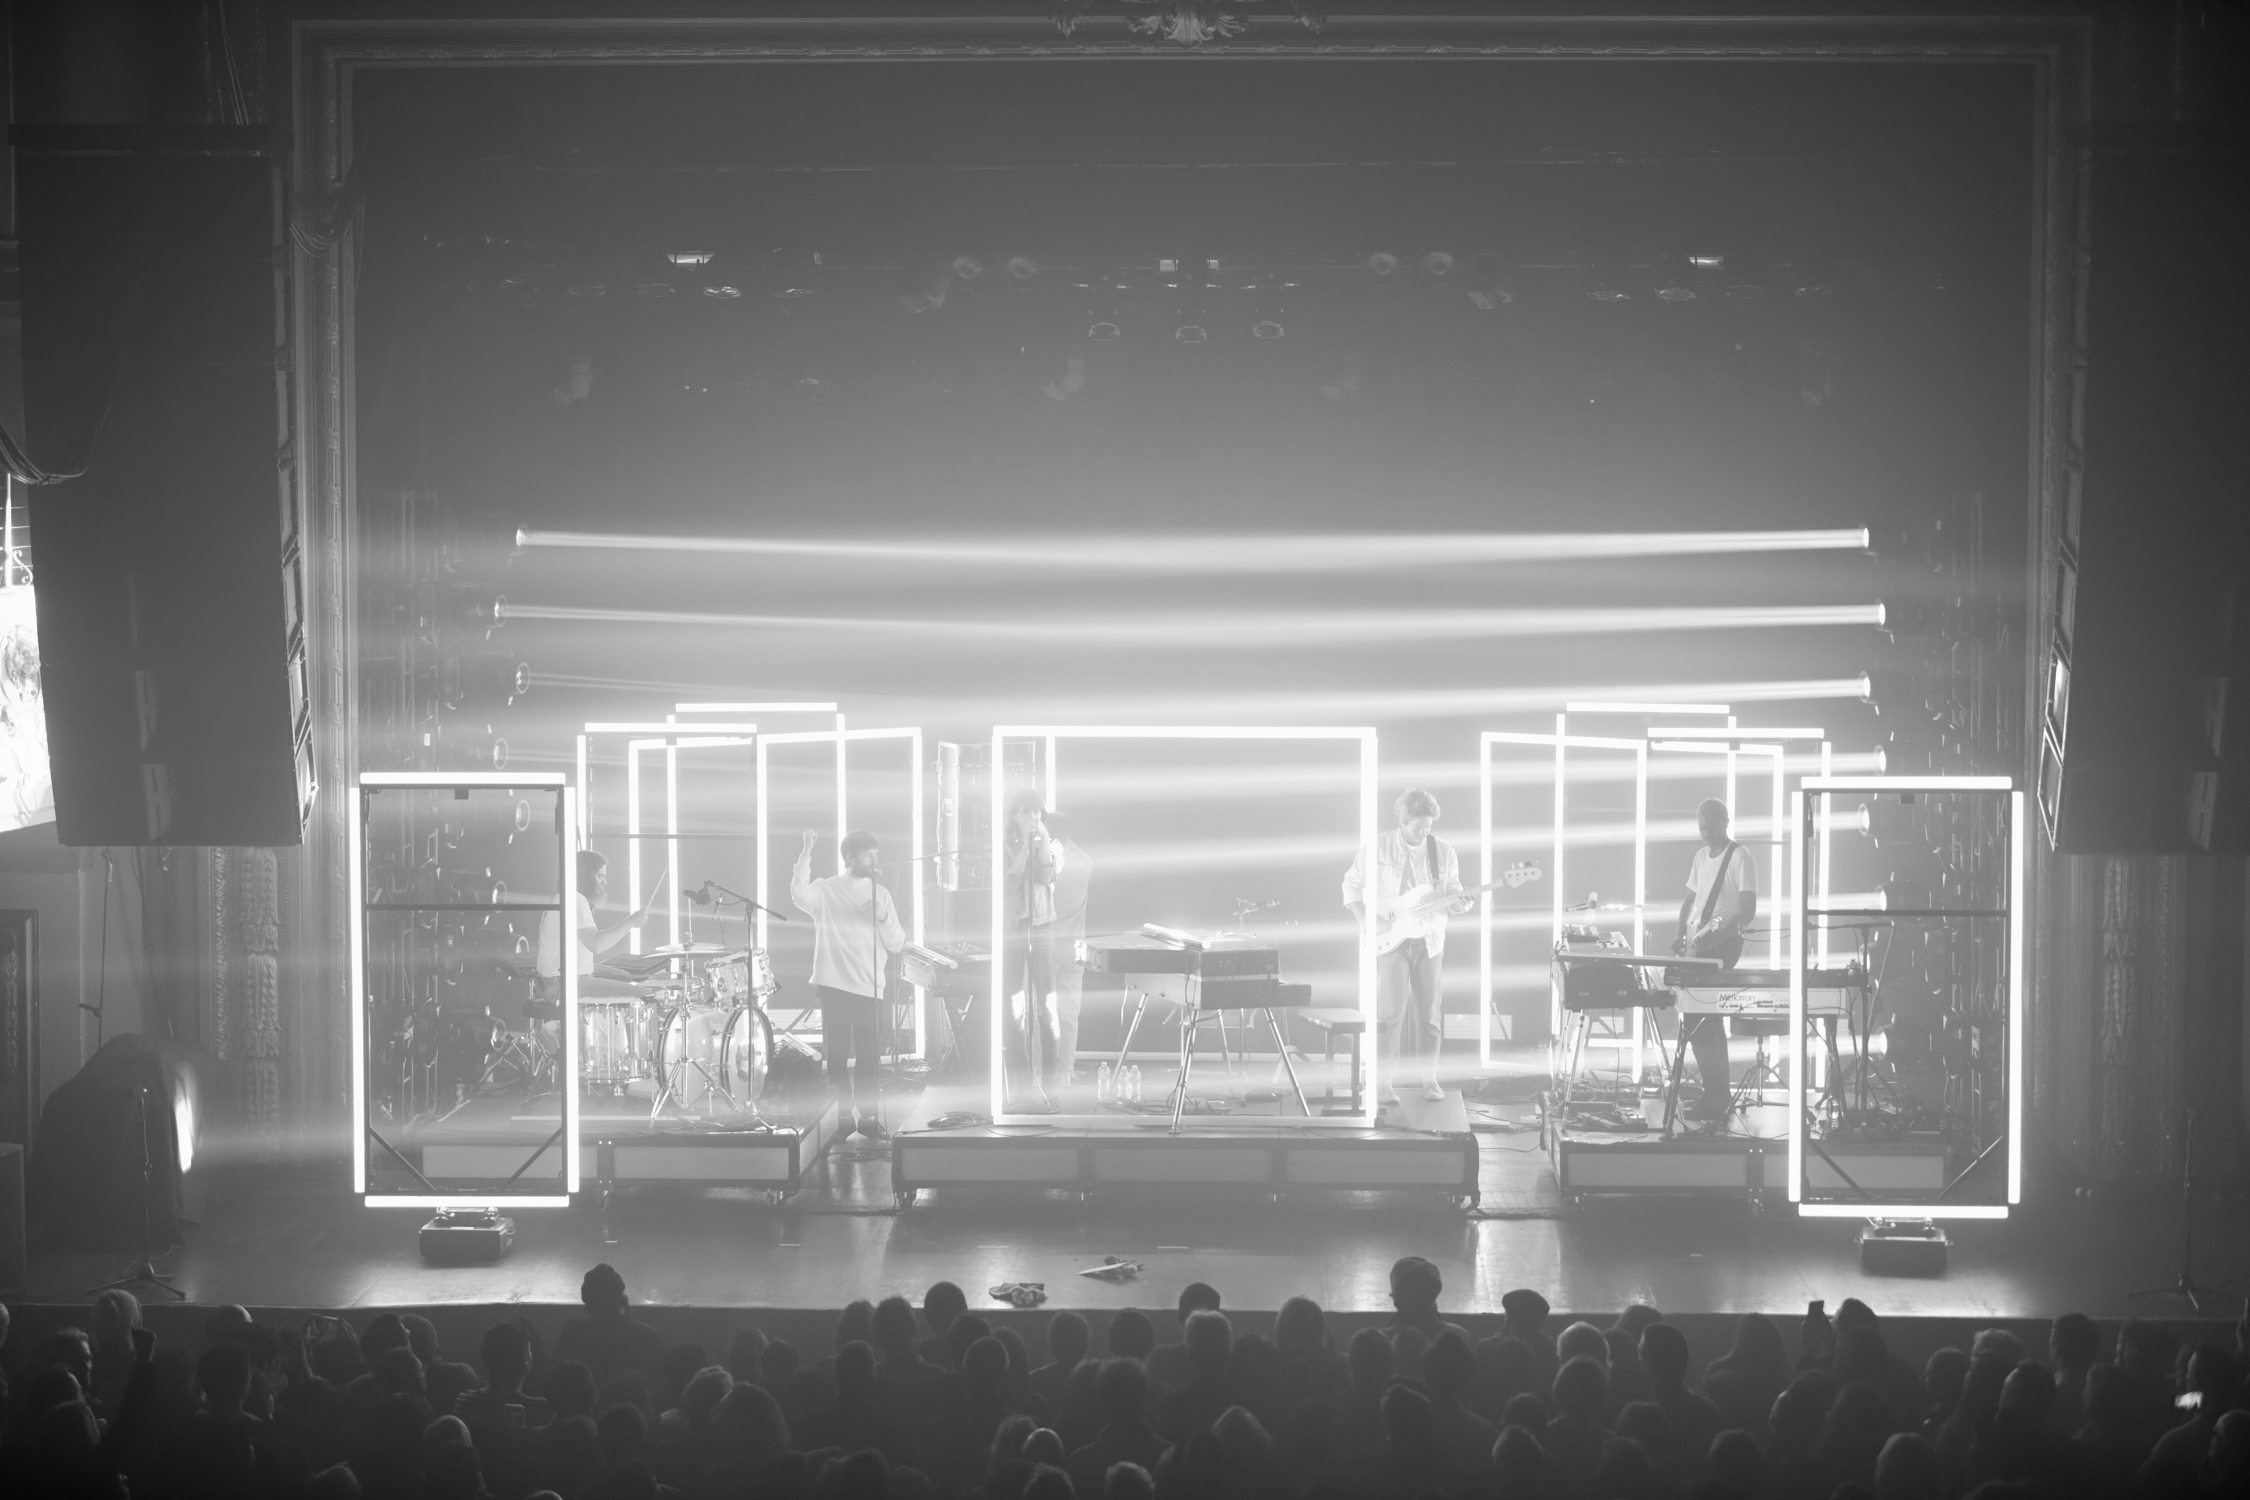 20190415 335 The Regency Ballroom - Charlotte Gainsbourg by Jon Bauer.jpg